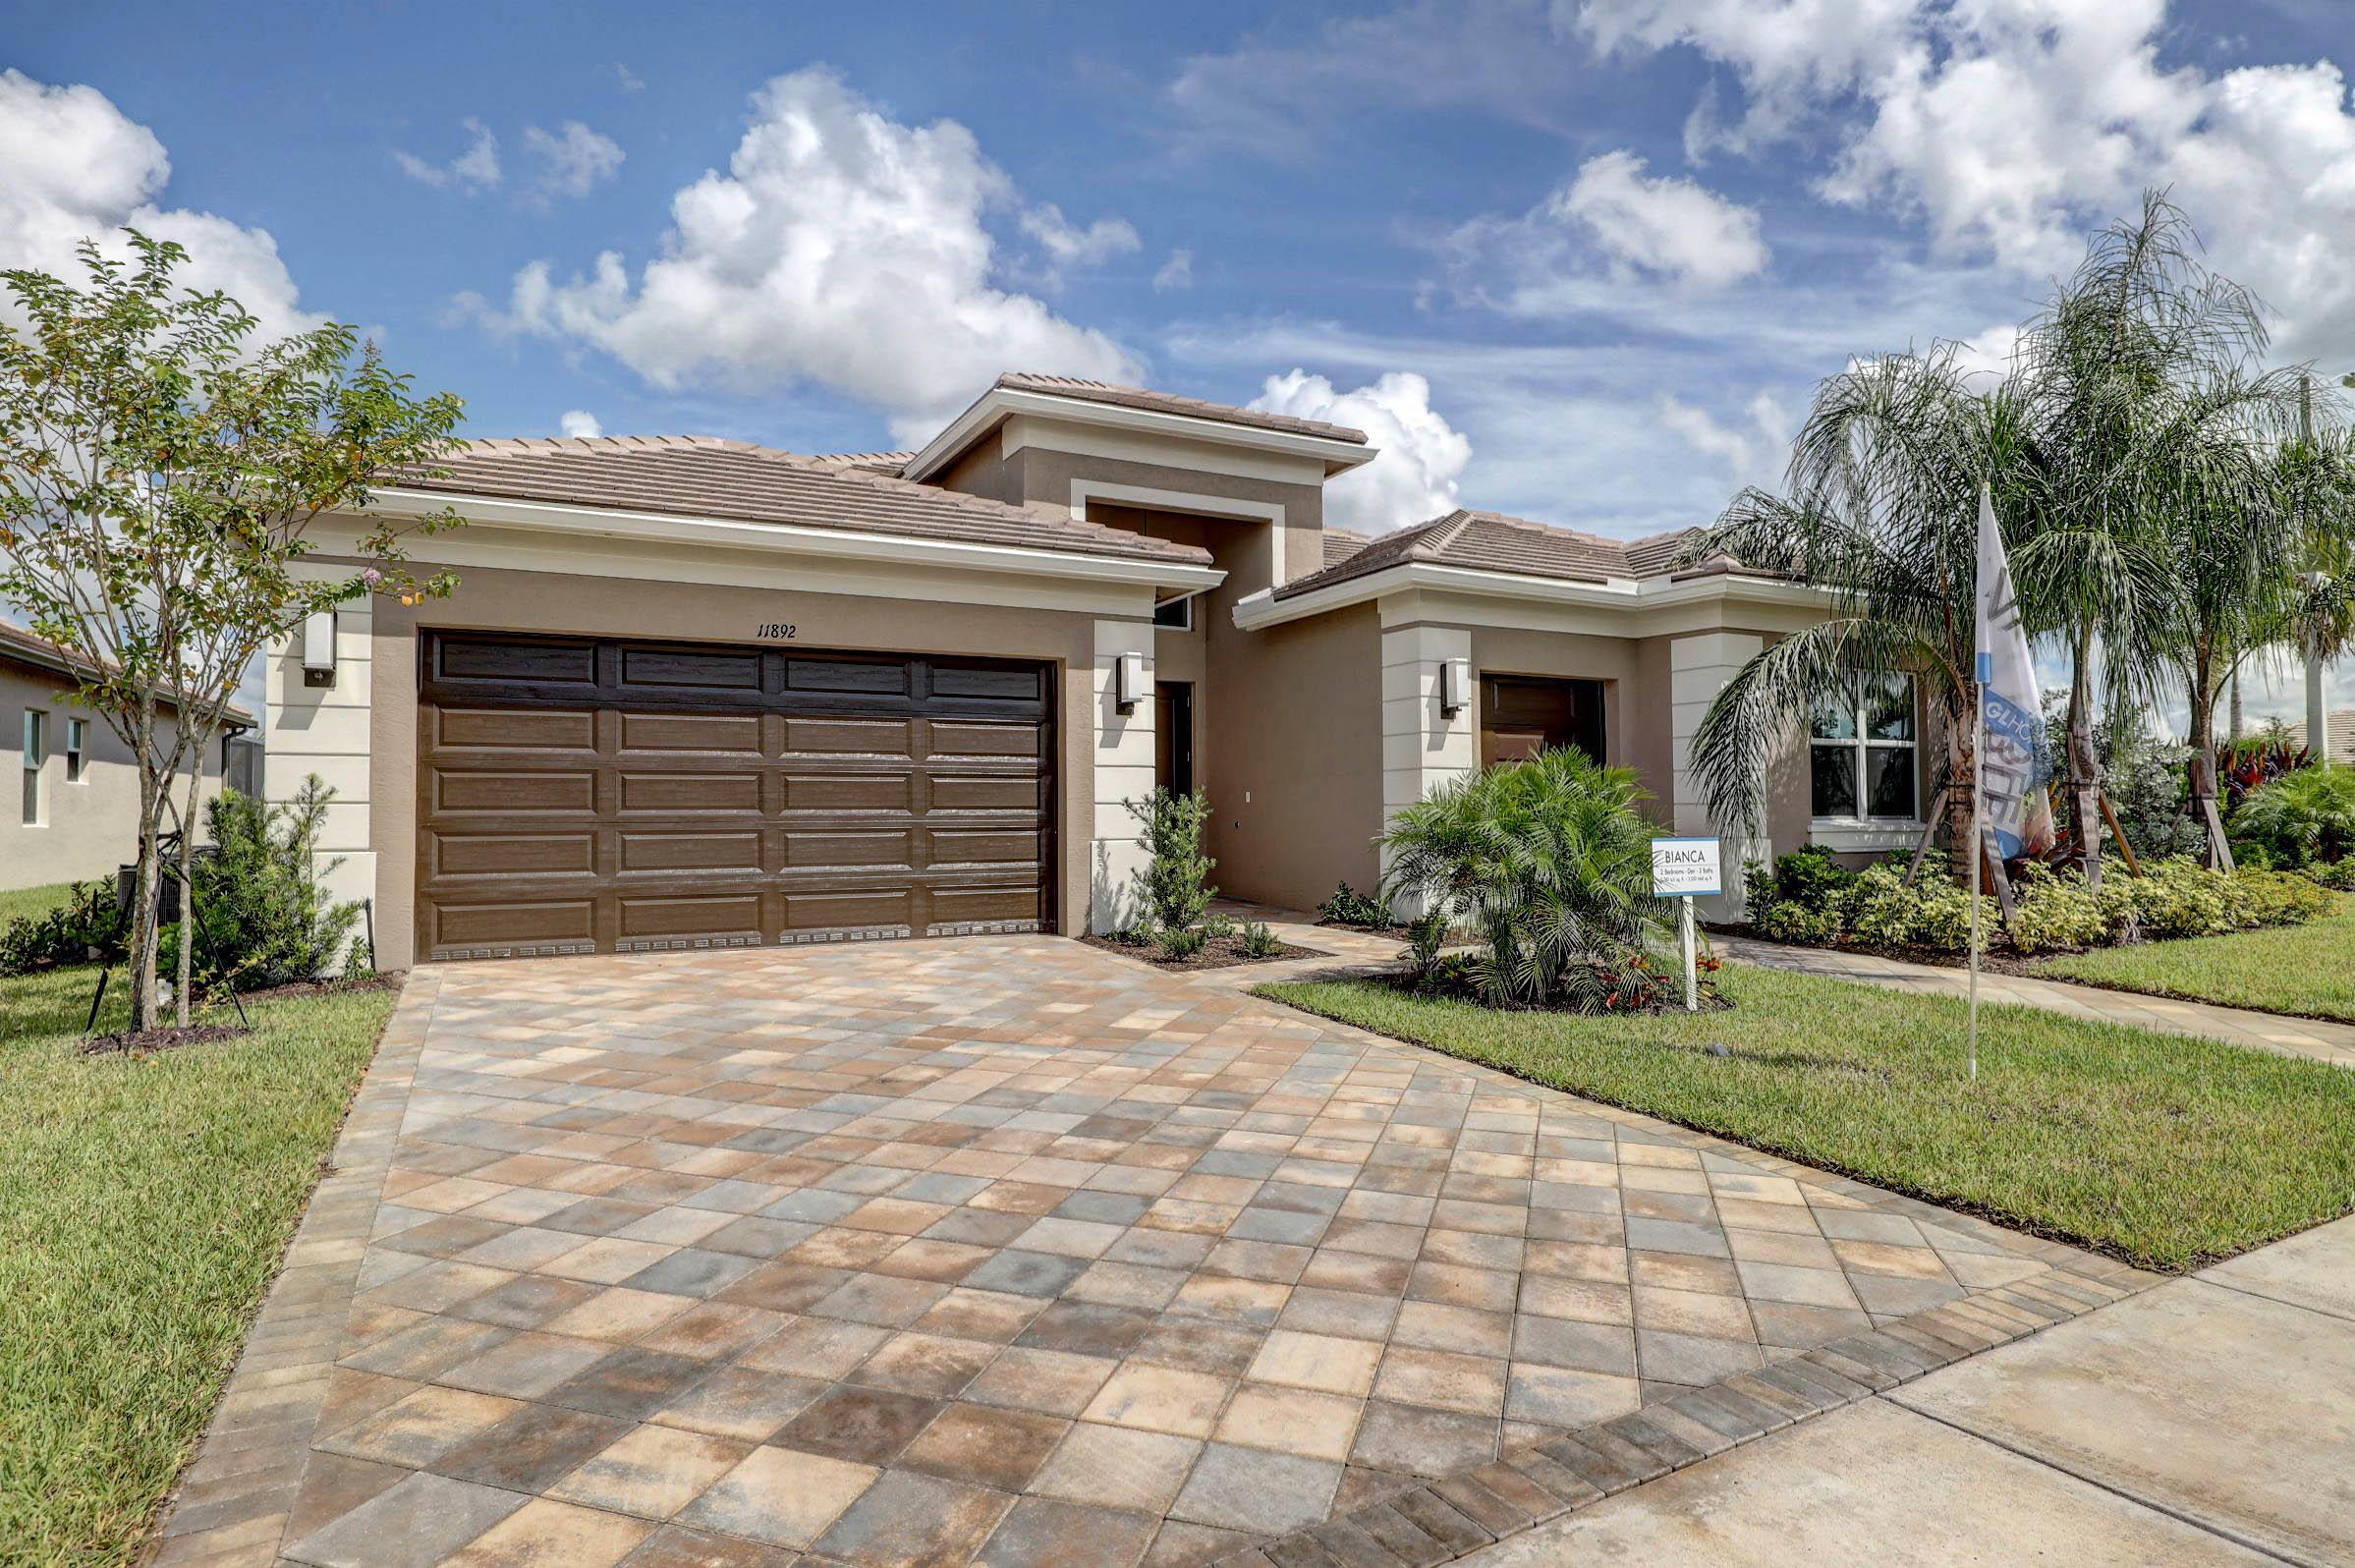 11892 Sw Hunter Hill Avenue, Port Saint Lucie, FL 34987